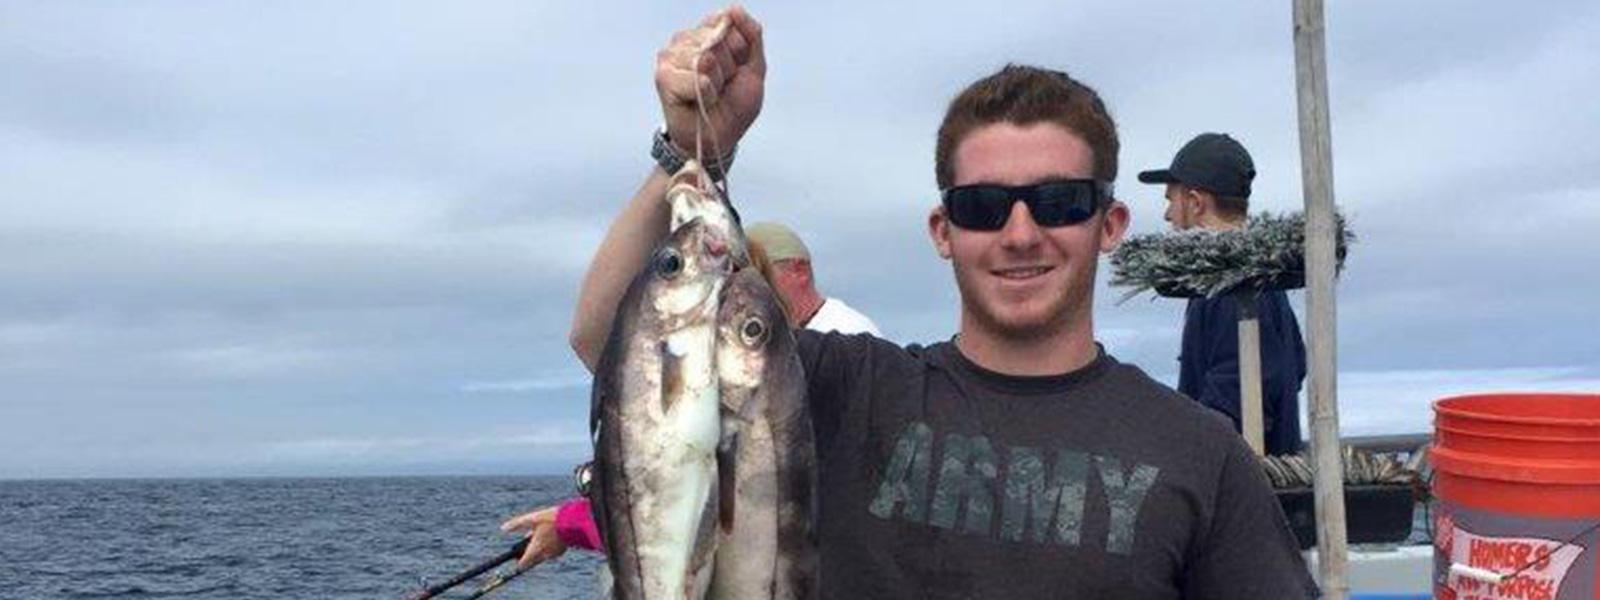 Captain John Boats fishing trip